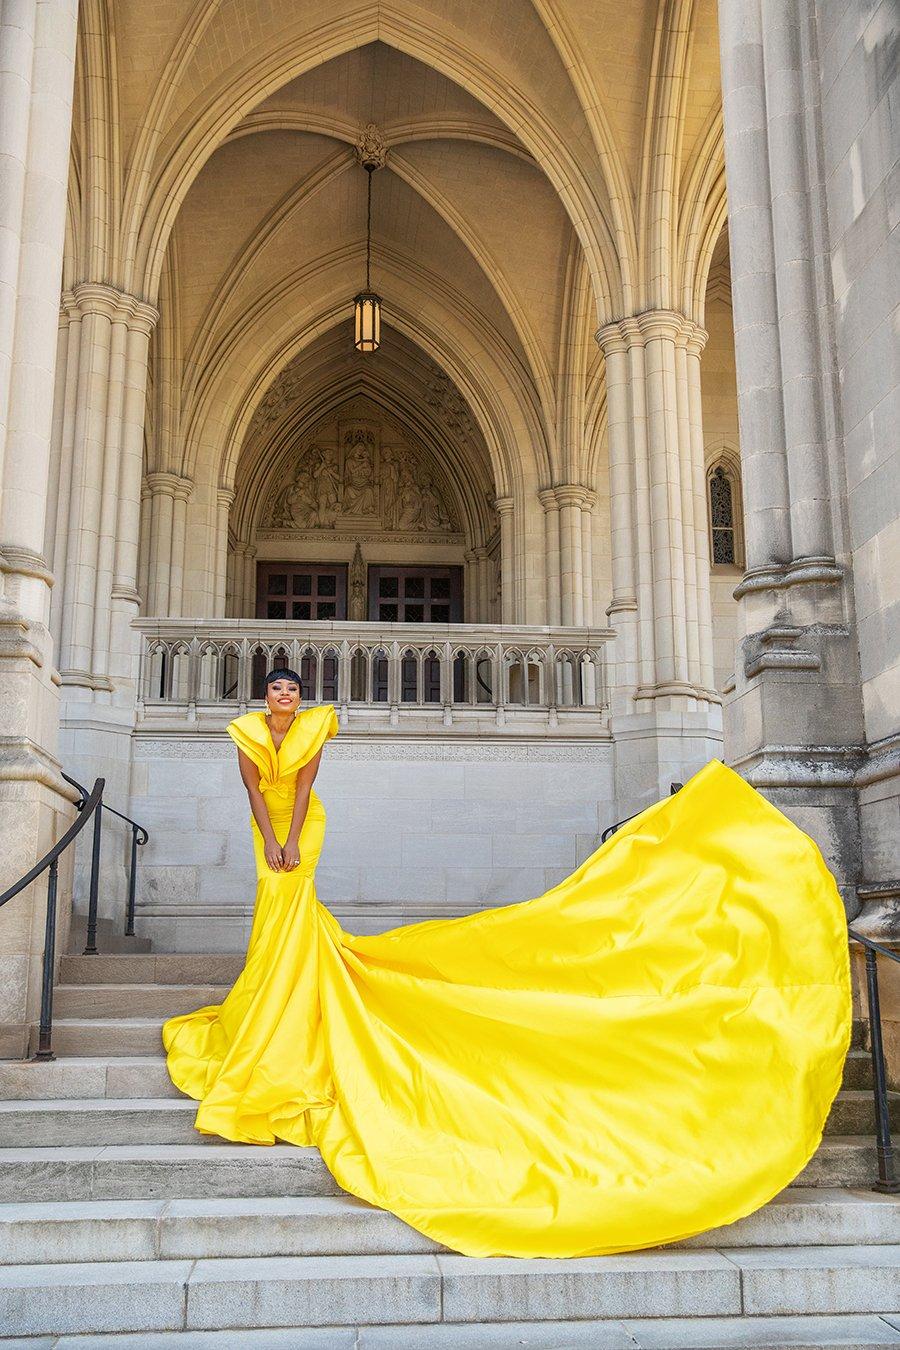 stella-adewunmi-of-jadore-fashion-blog-shares-ball-gown-wedding-style-zoe-arku-design